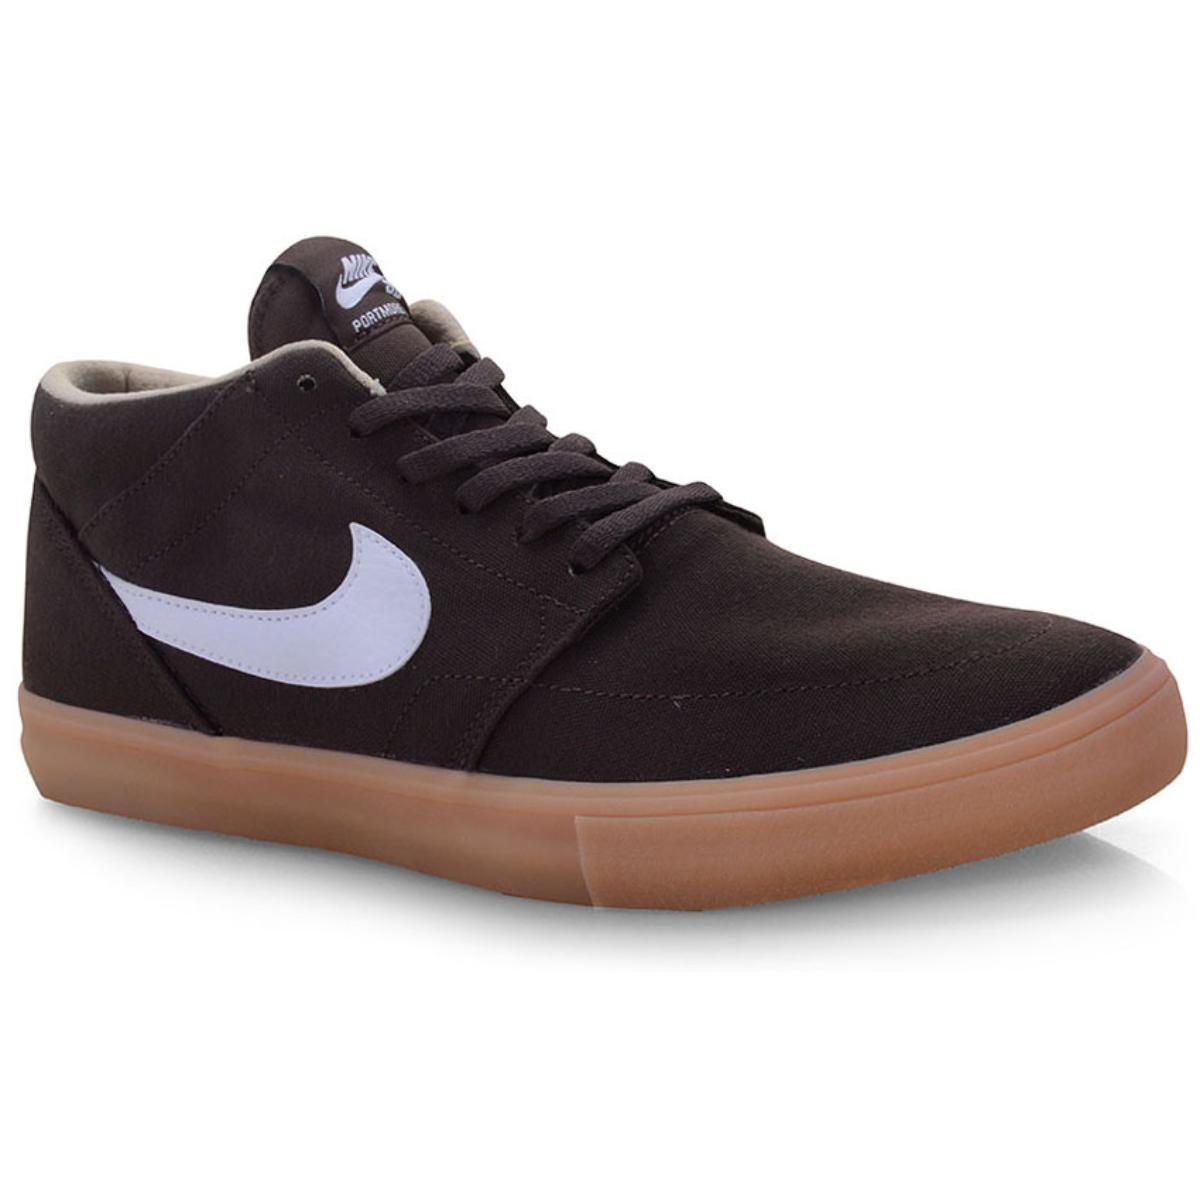 Tênis Masculino Nike Aq7728-200 sb Portmore ii Slr m Cnvs Marrom/branco